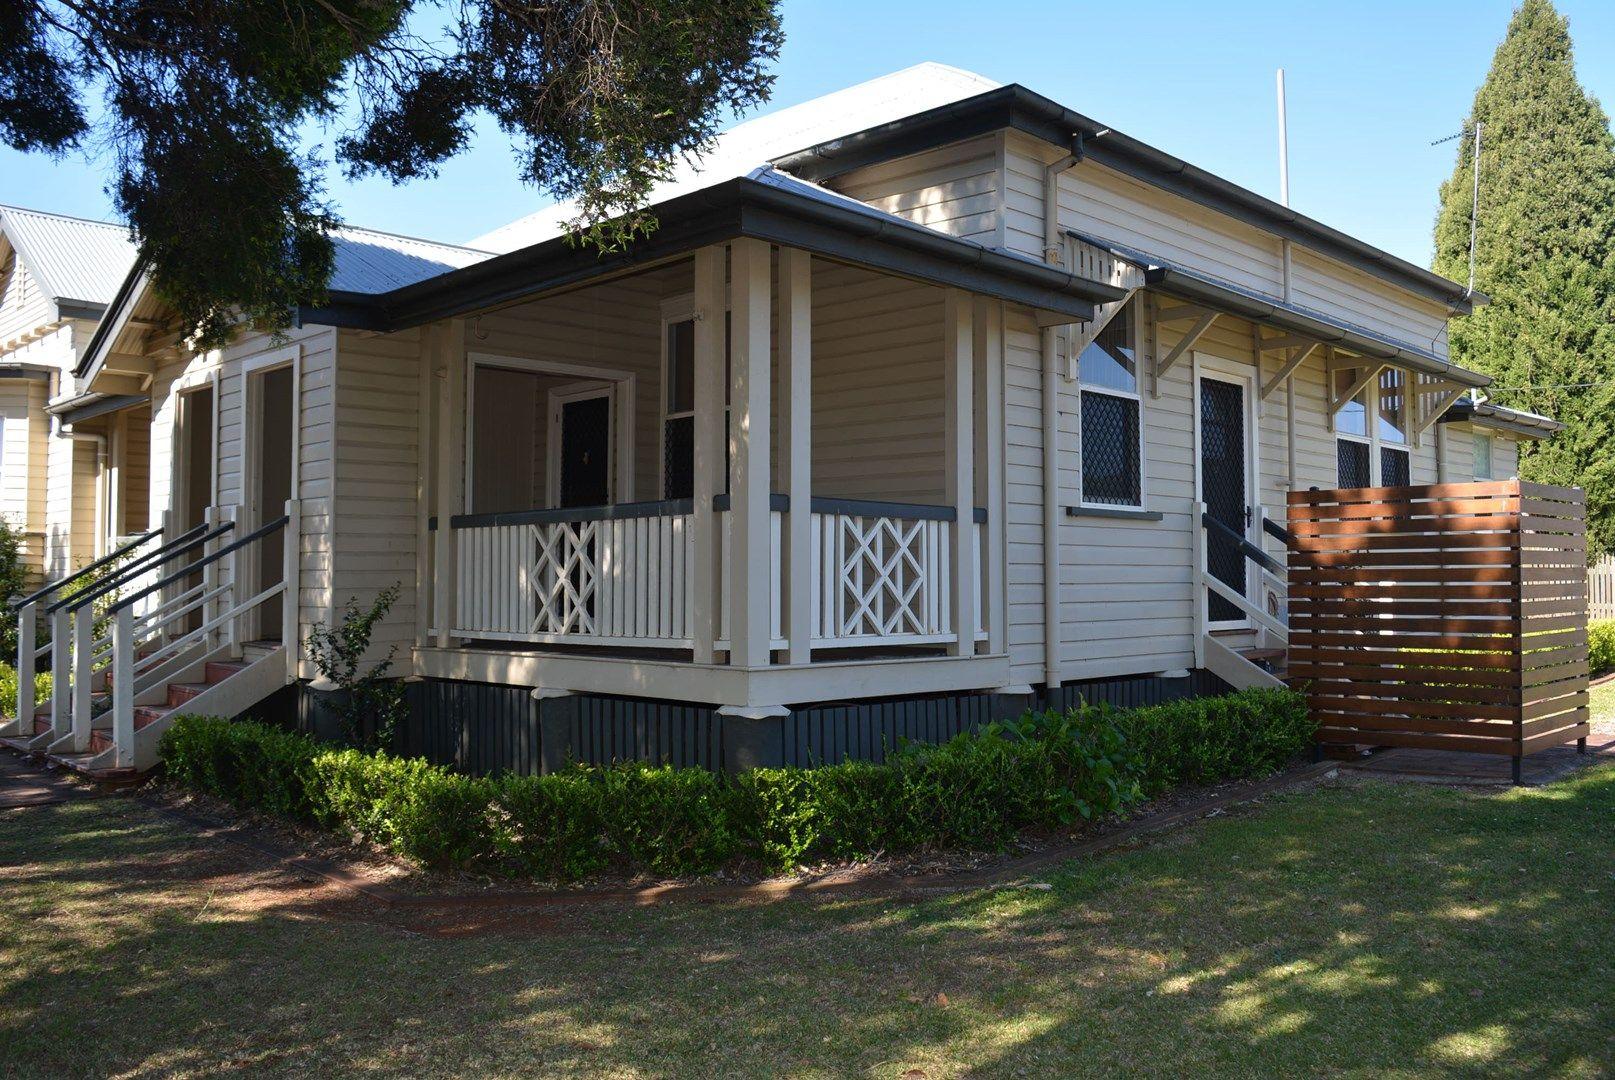 2/124 Hume Street, East Toowoomba QLD 4350, Image 0